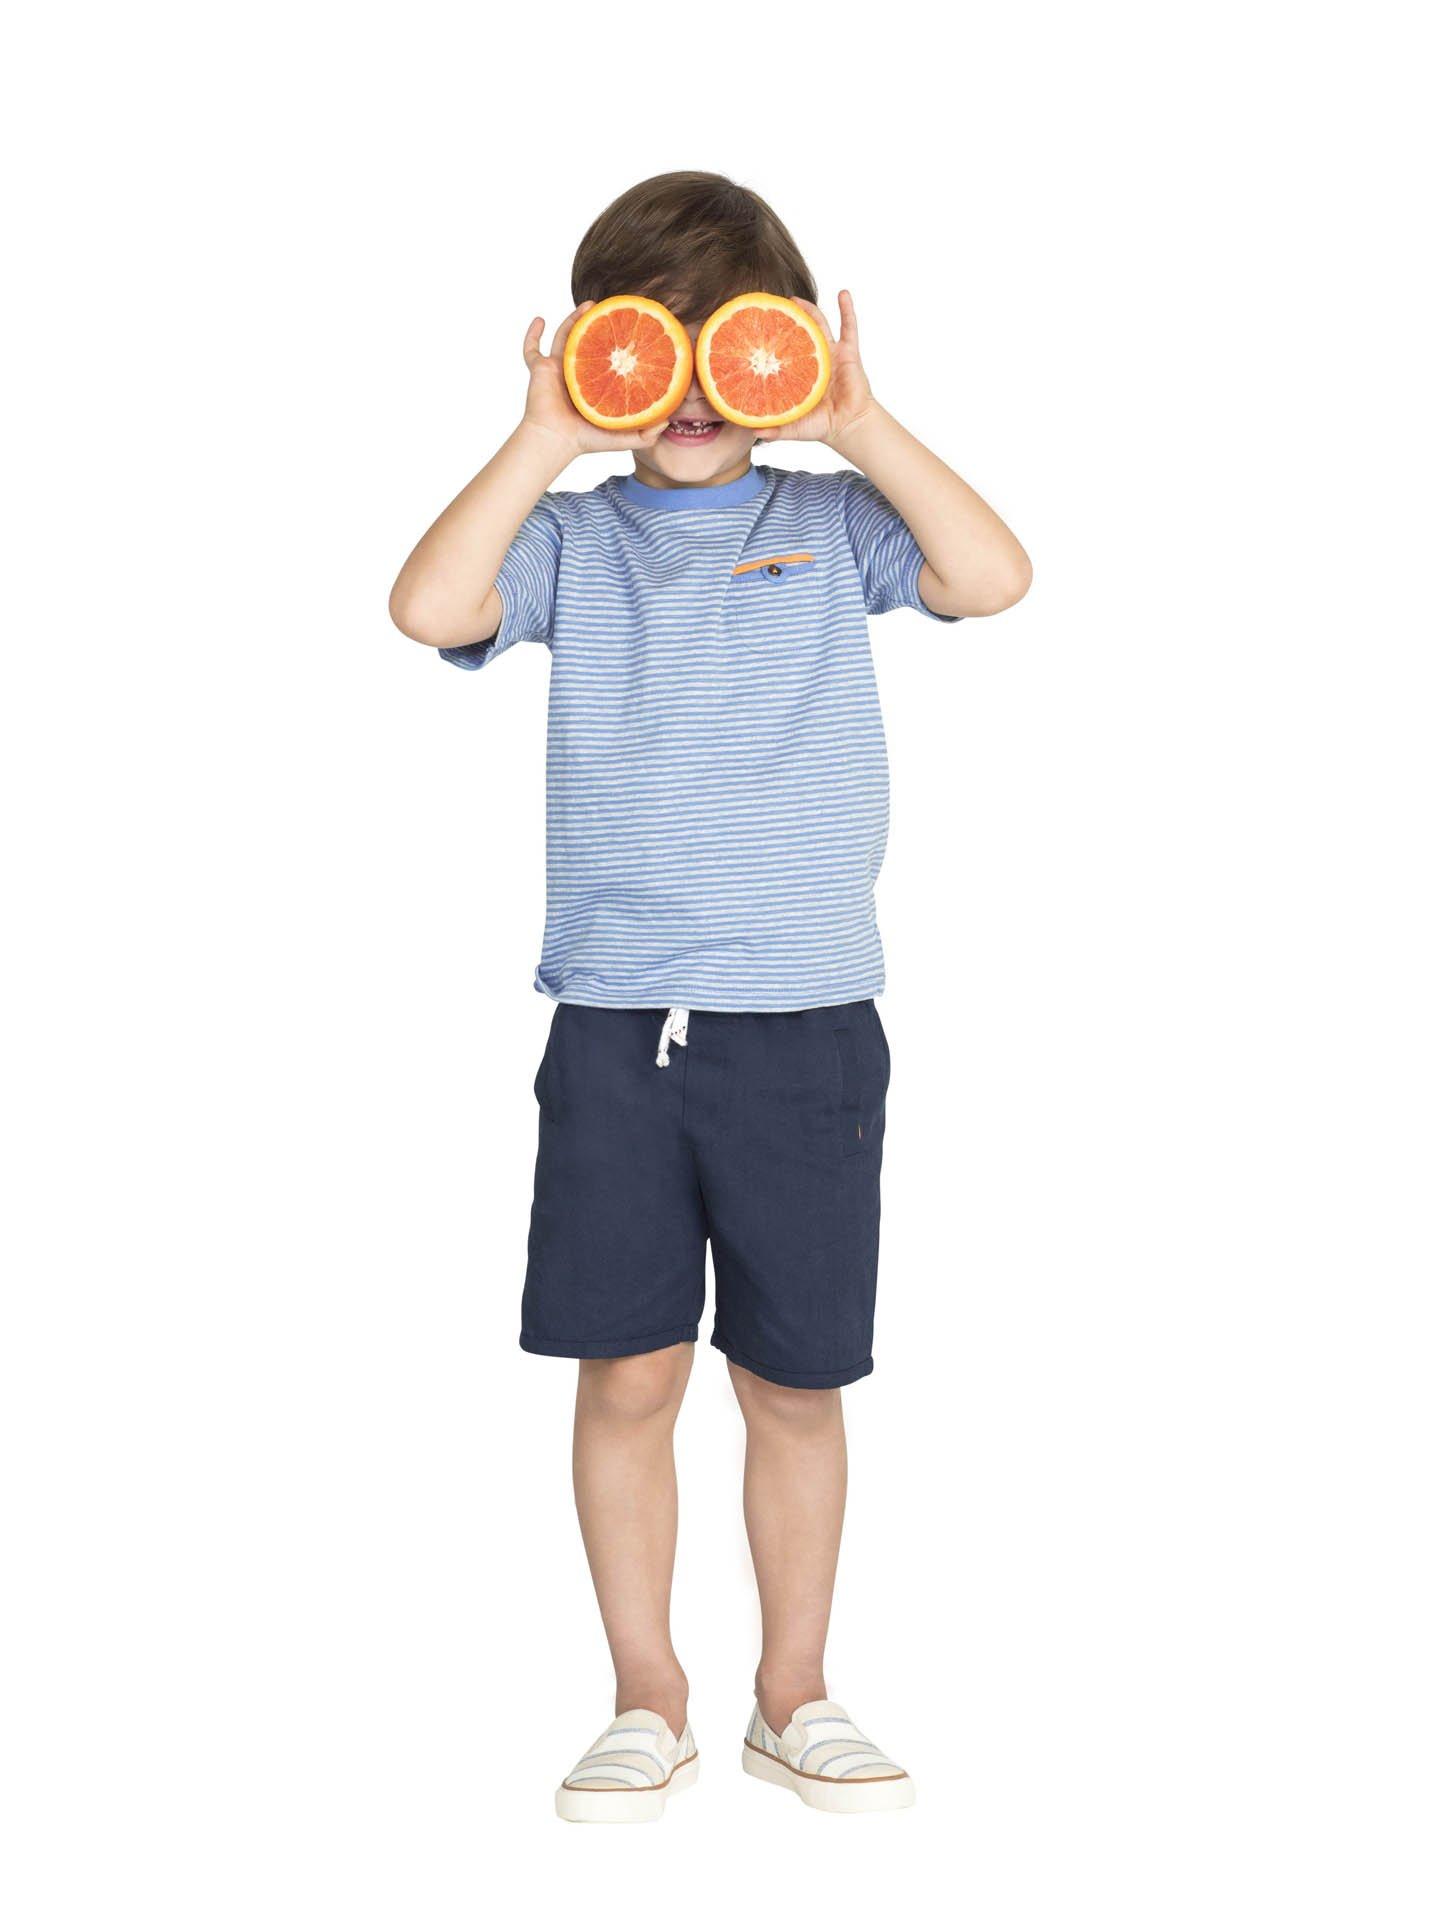 Colored Organics Boys Organic Crew Tee Shirt - Blue Stripe - 5T by Colored Organics (Image #1)